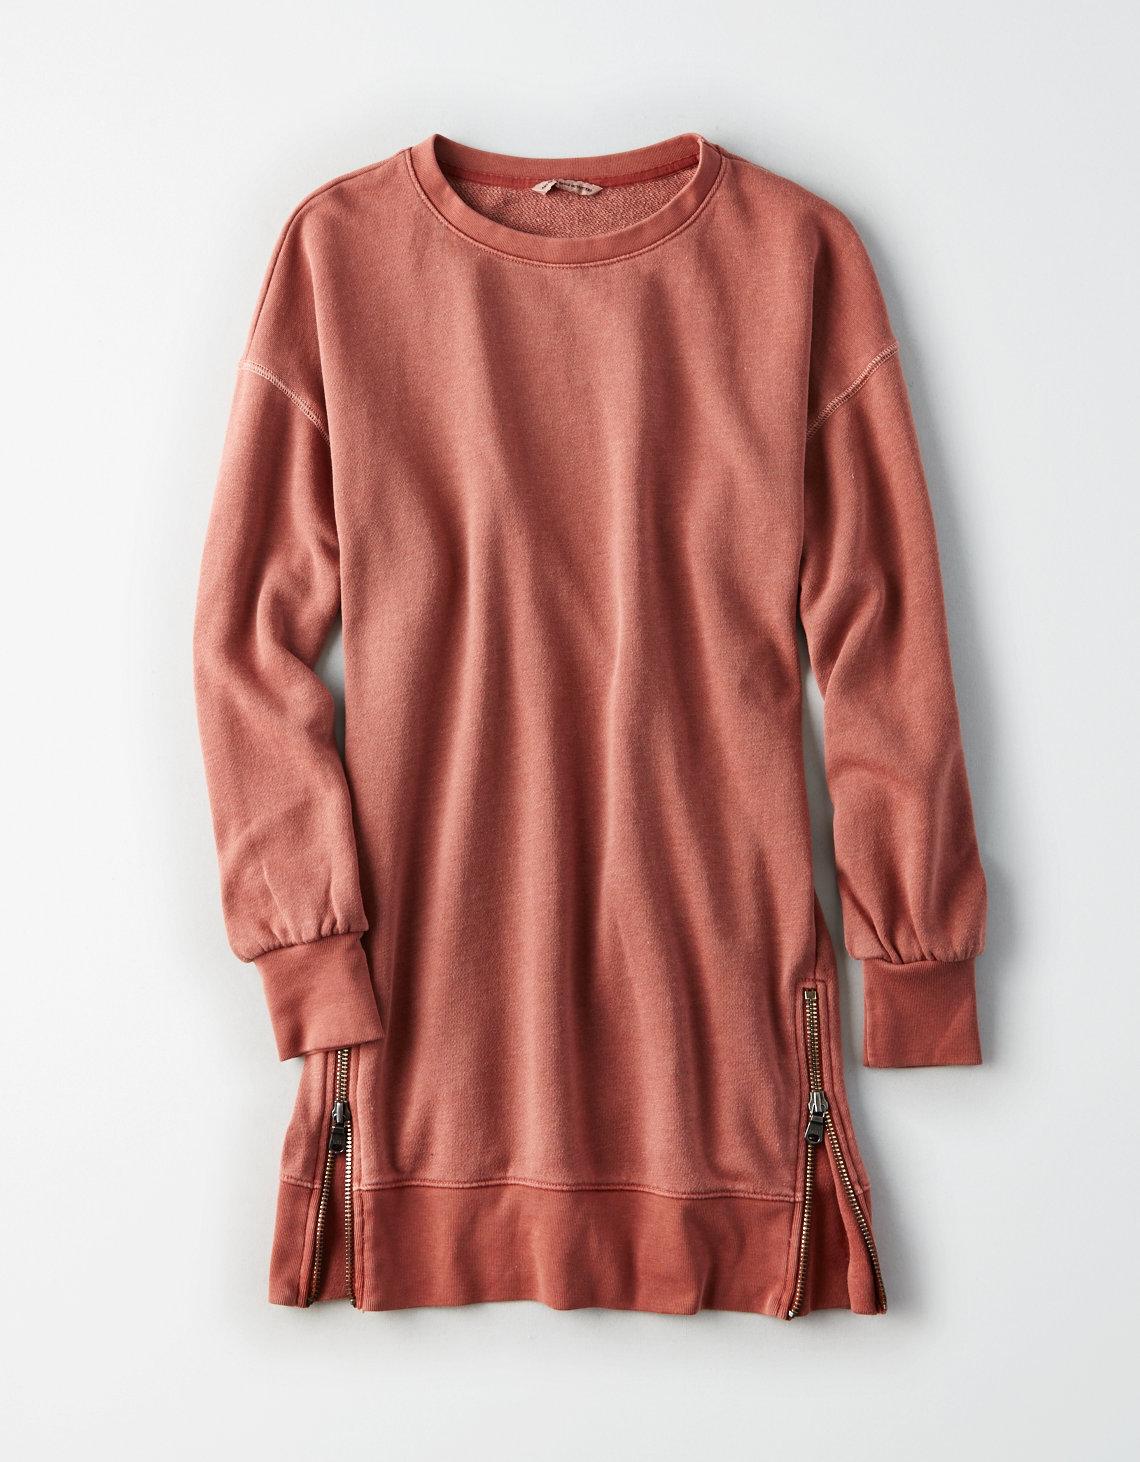 AE ACTIVE WASHED BALLOON SLEEVE FLEECE ZIPPER DRESS